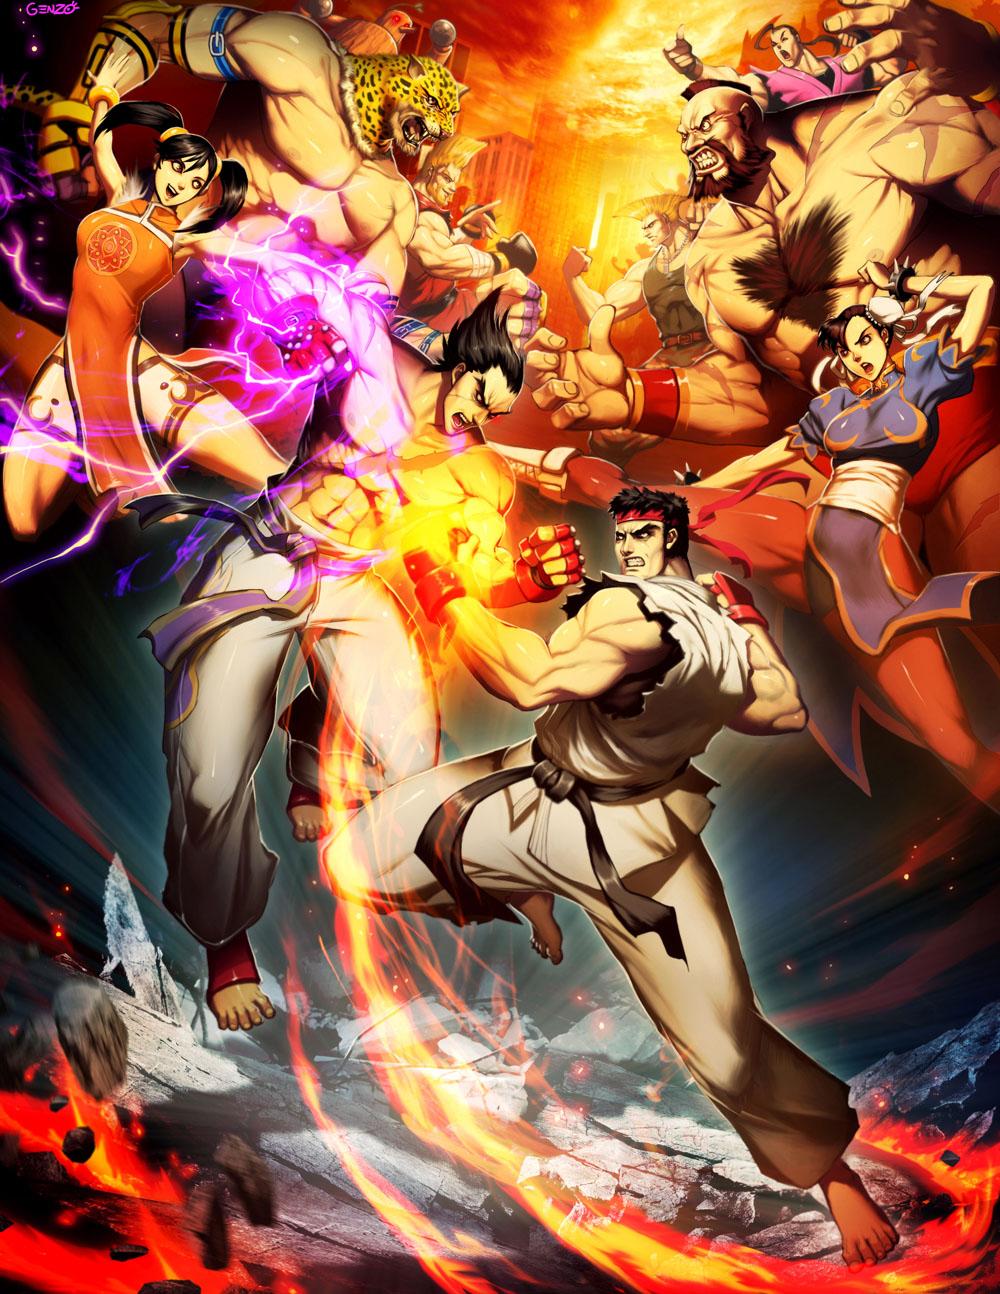 Street Fighter X Tekken by GENZOMAN on DeviantArt